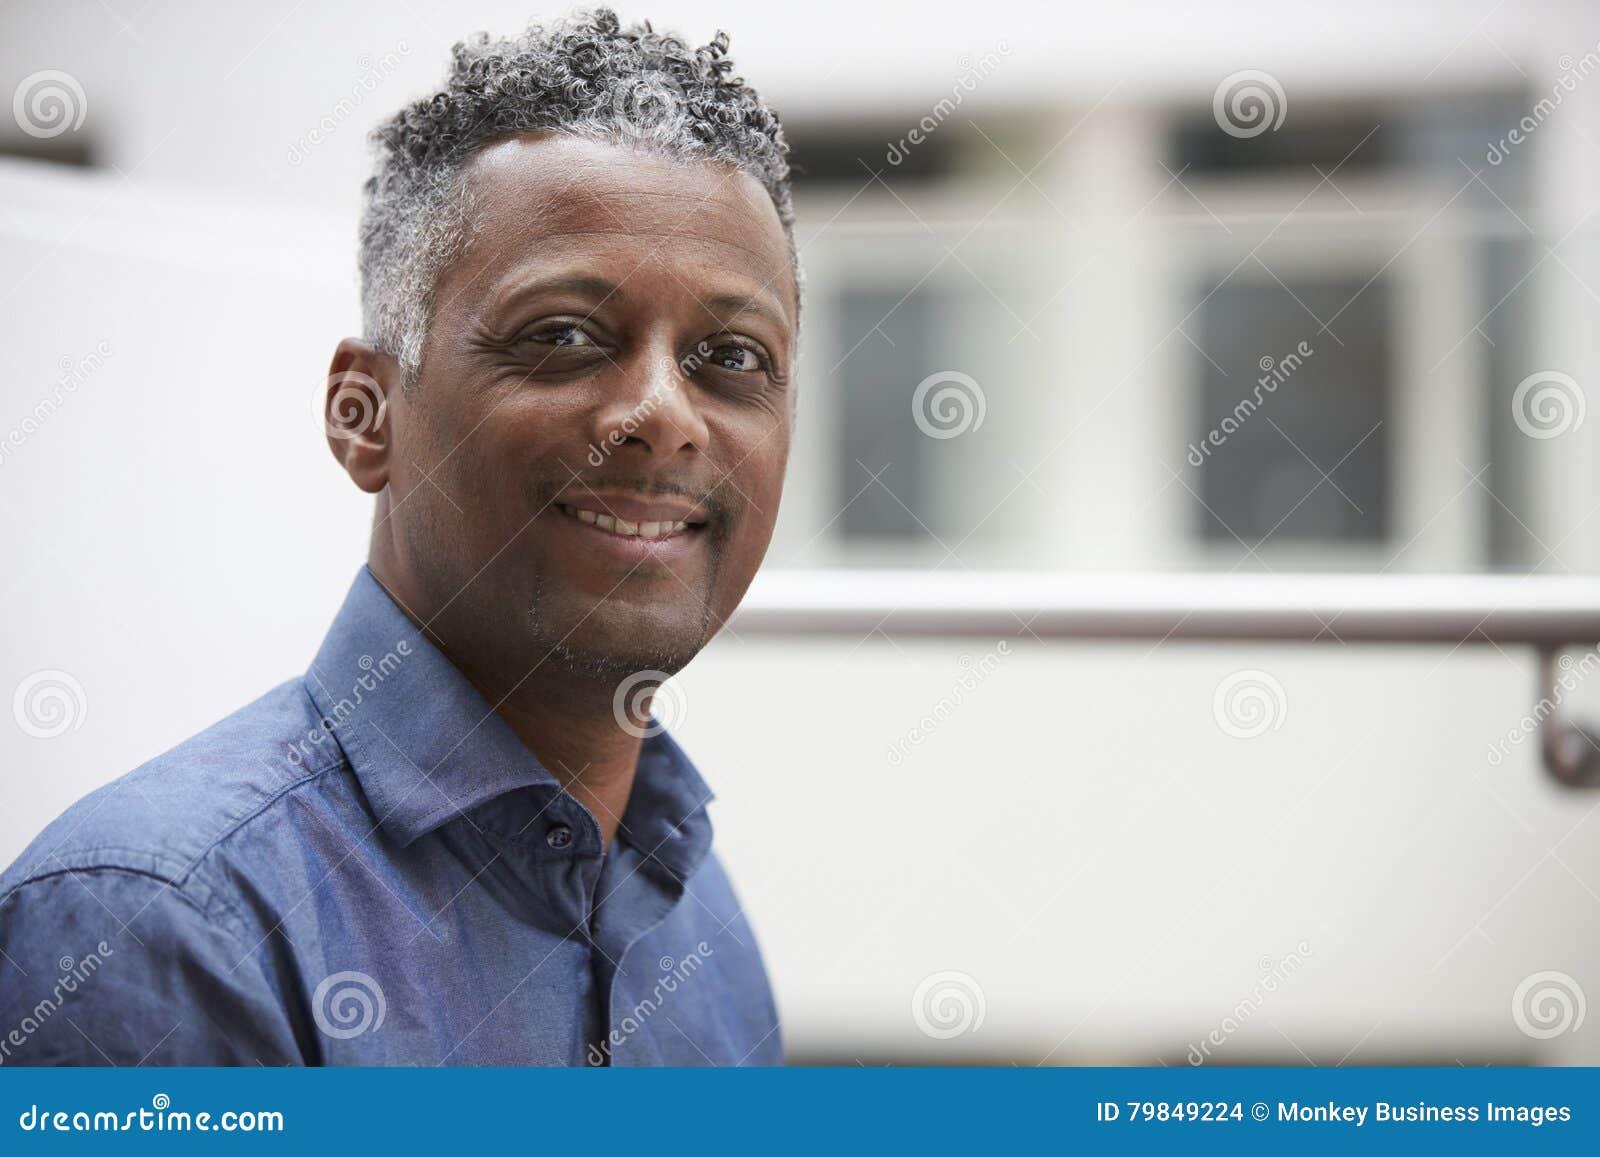 Middle aged black man